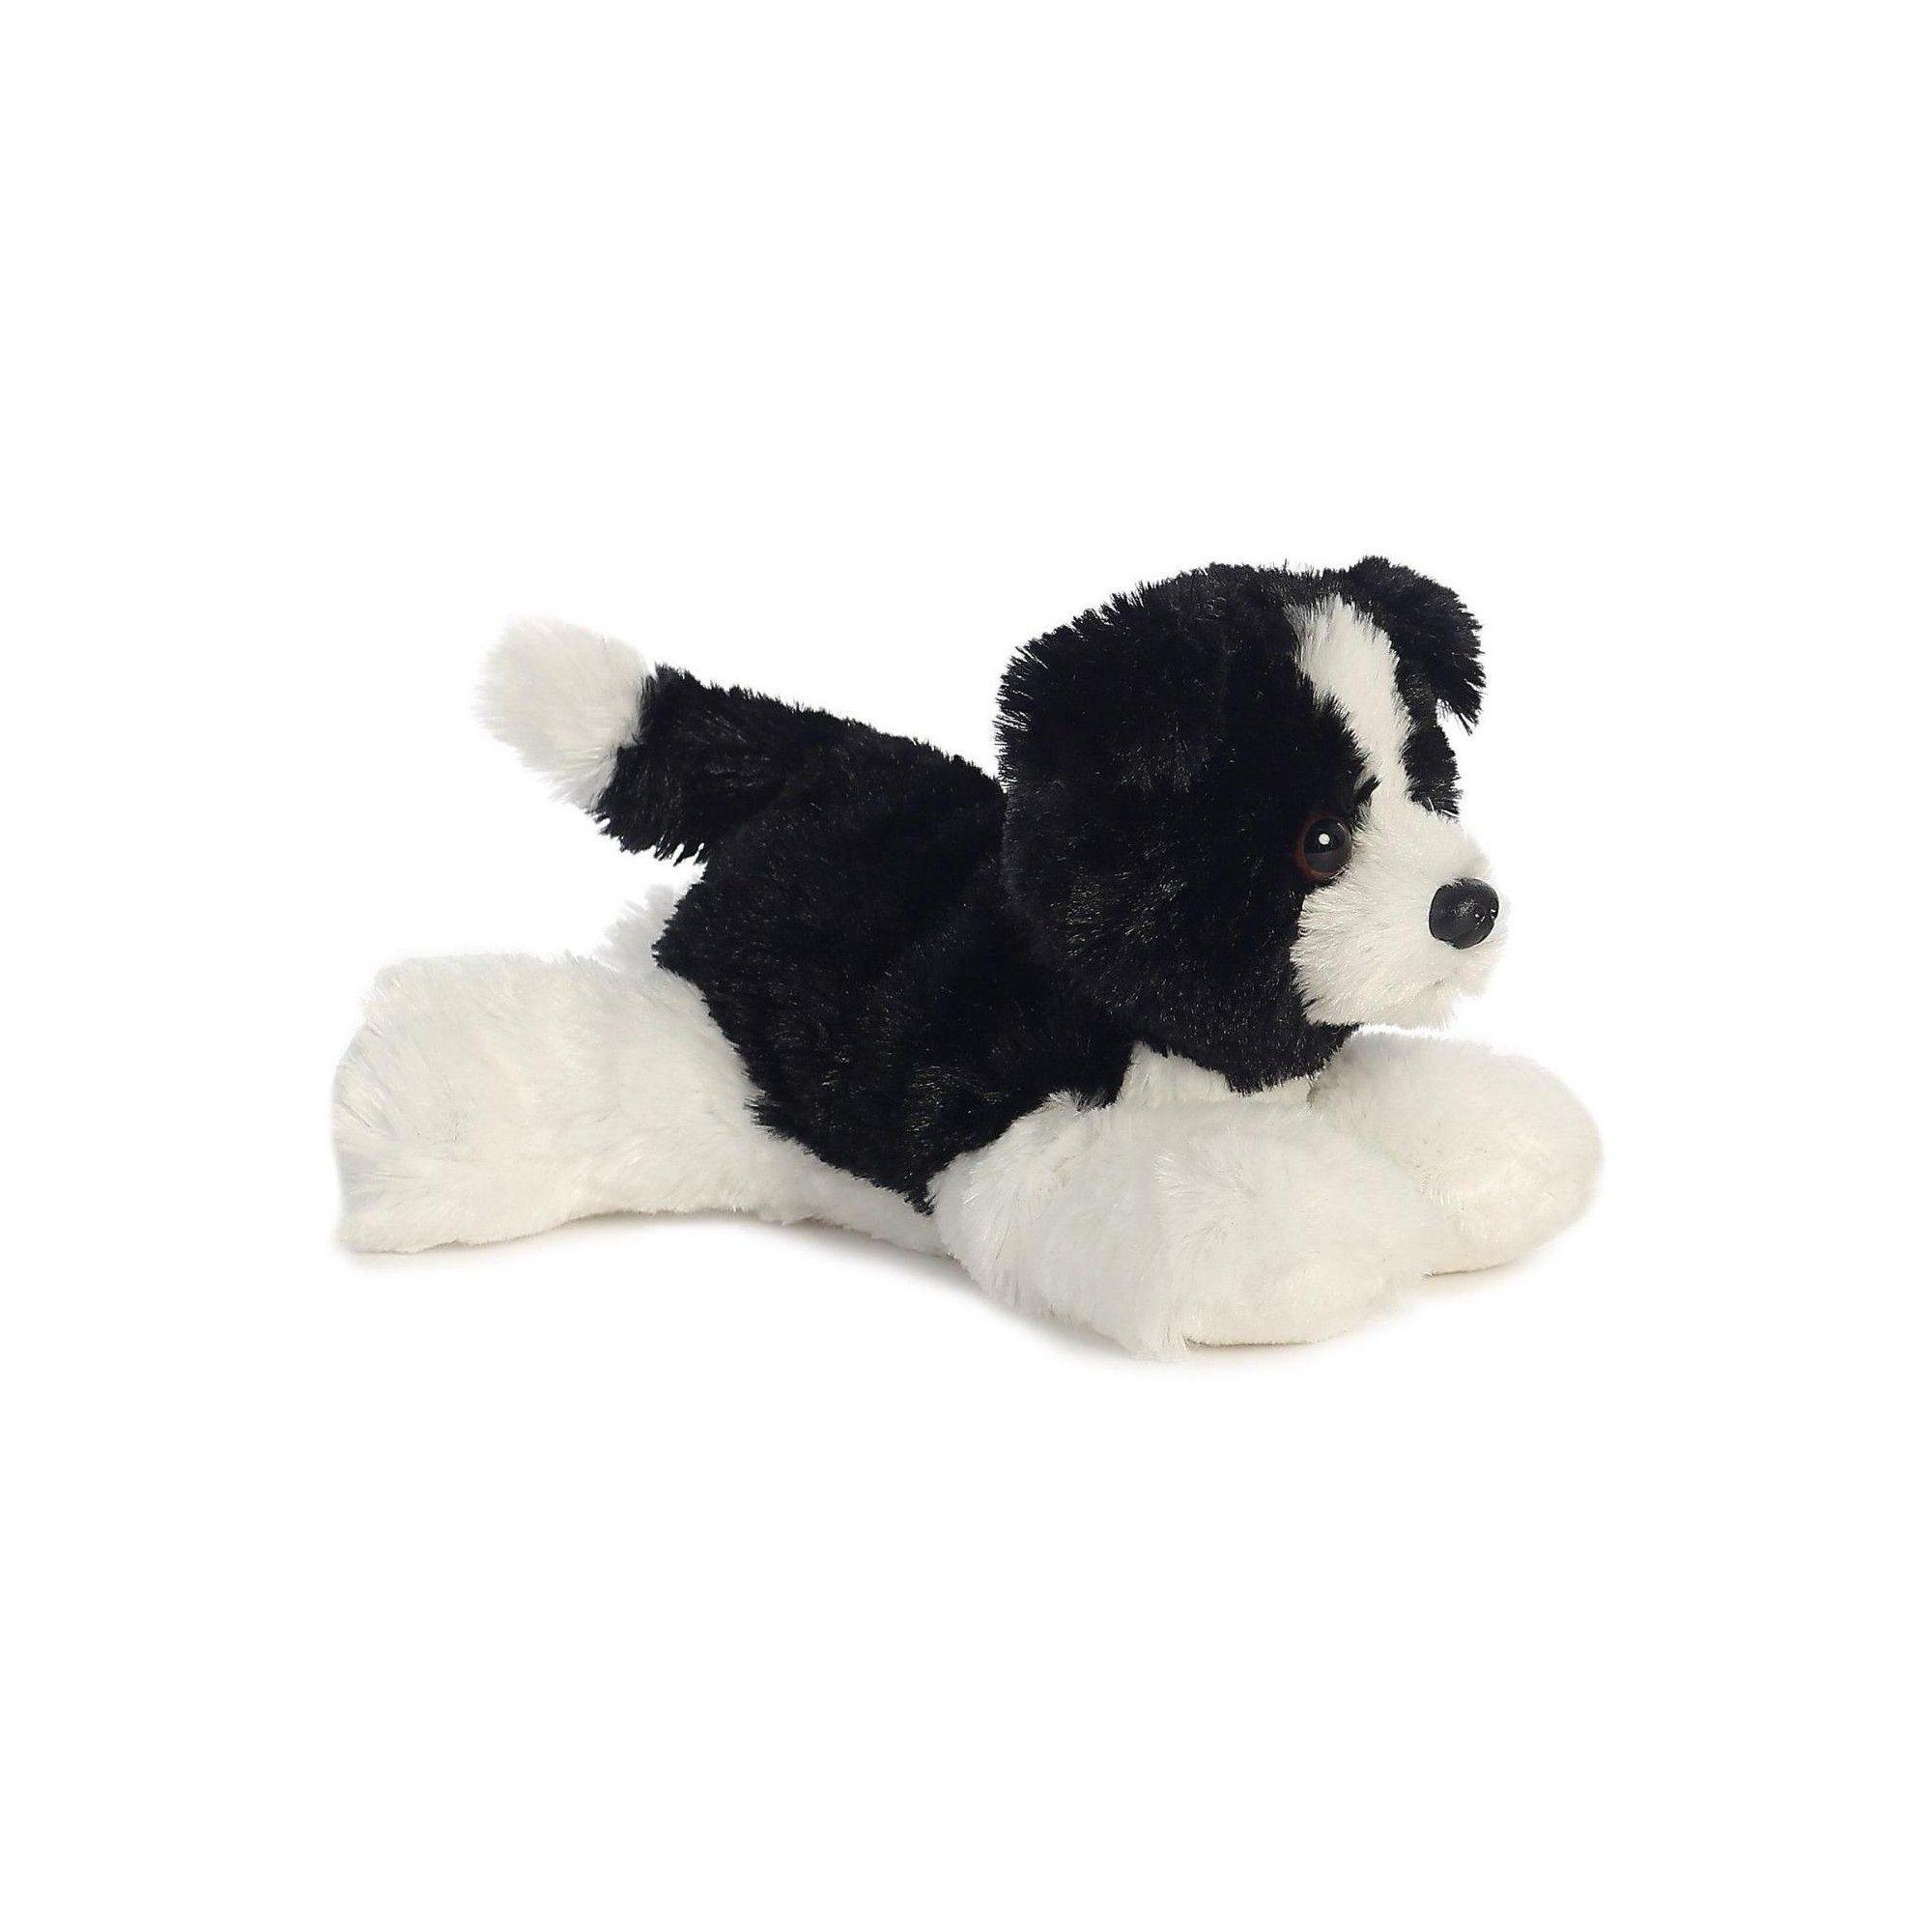 Cami Border Collie Mini Flopsie 8 Inch Stuffed Animal By Aurora